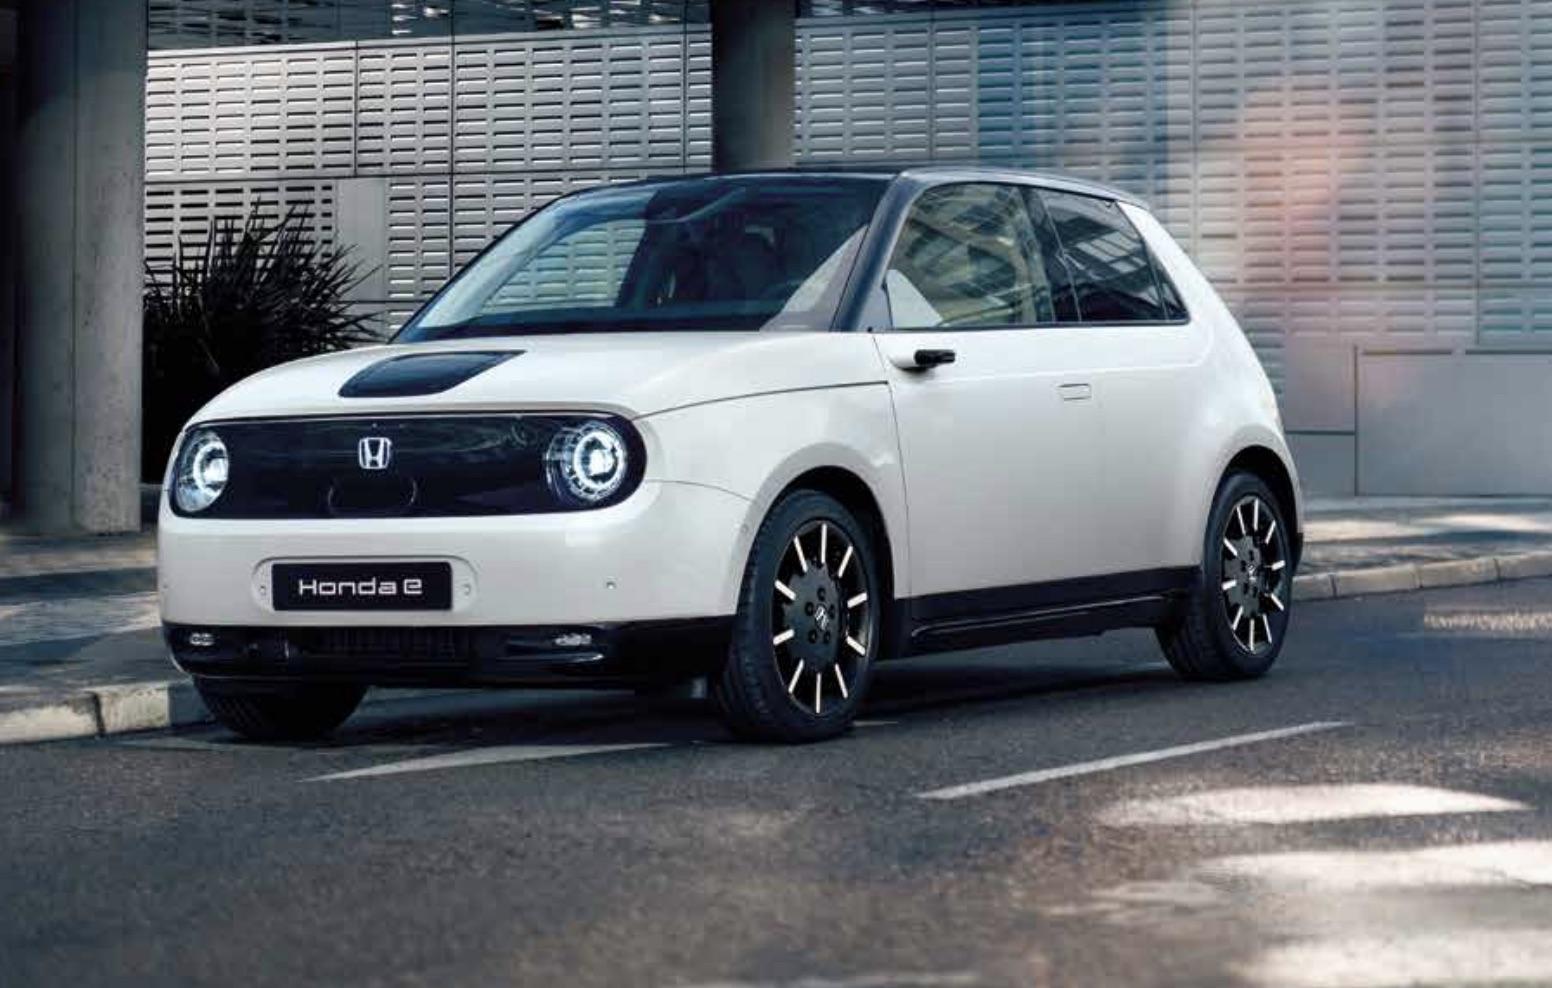 Tesla-Honda-Fiat-Chrysler-pooling-deal